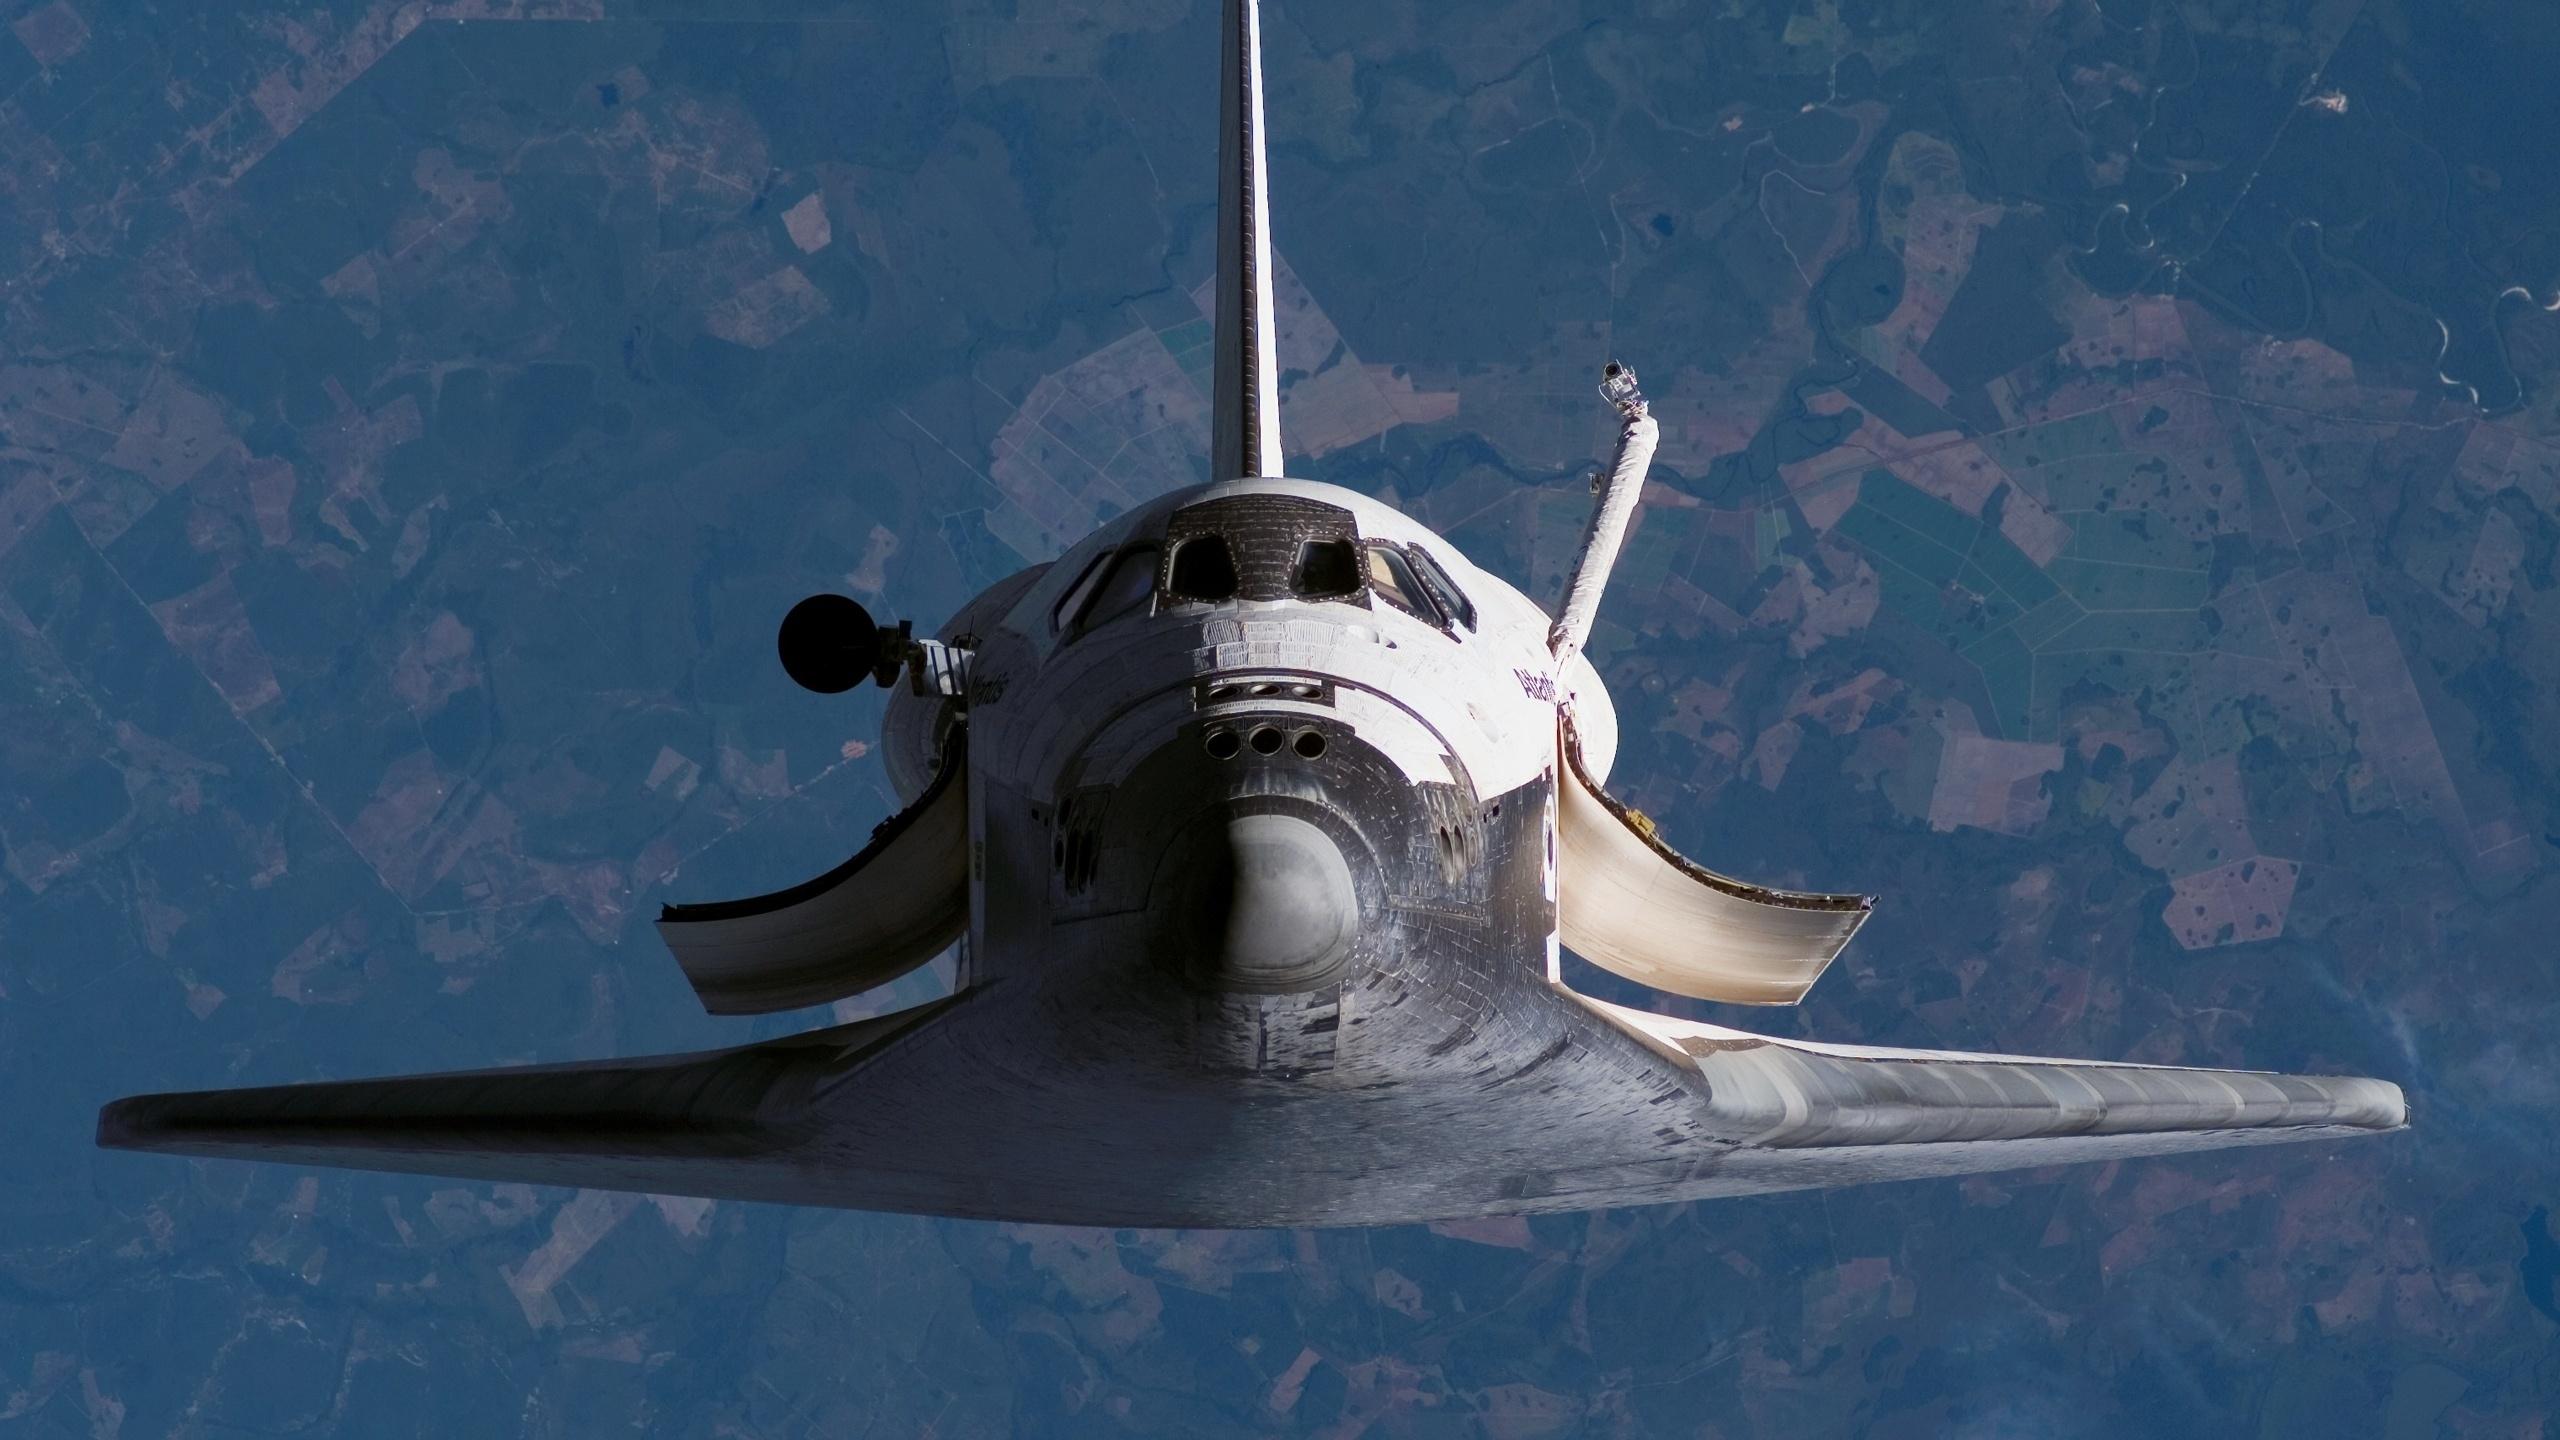 2560x1440 Space Shuttle desktop PC and Mac wallpaper